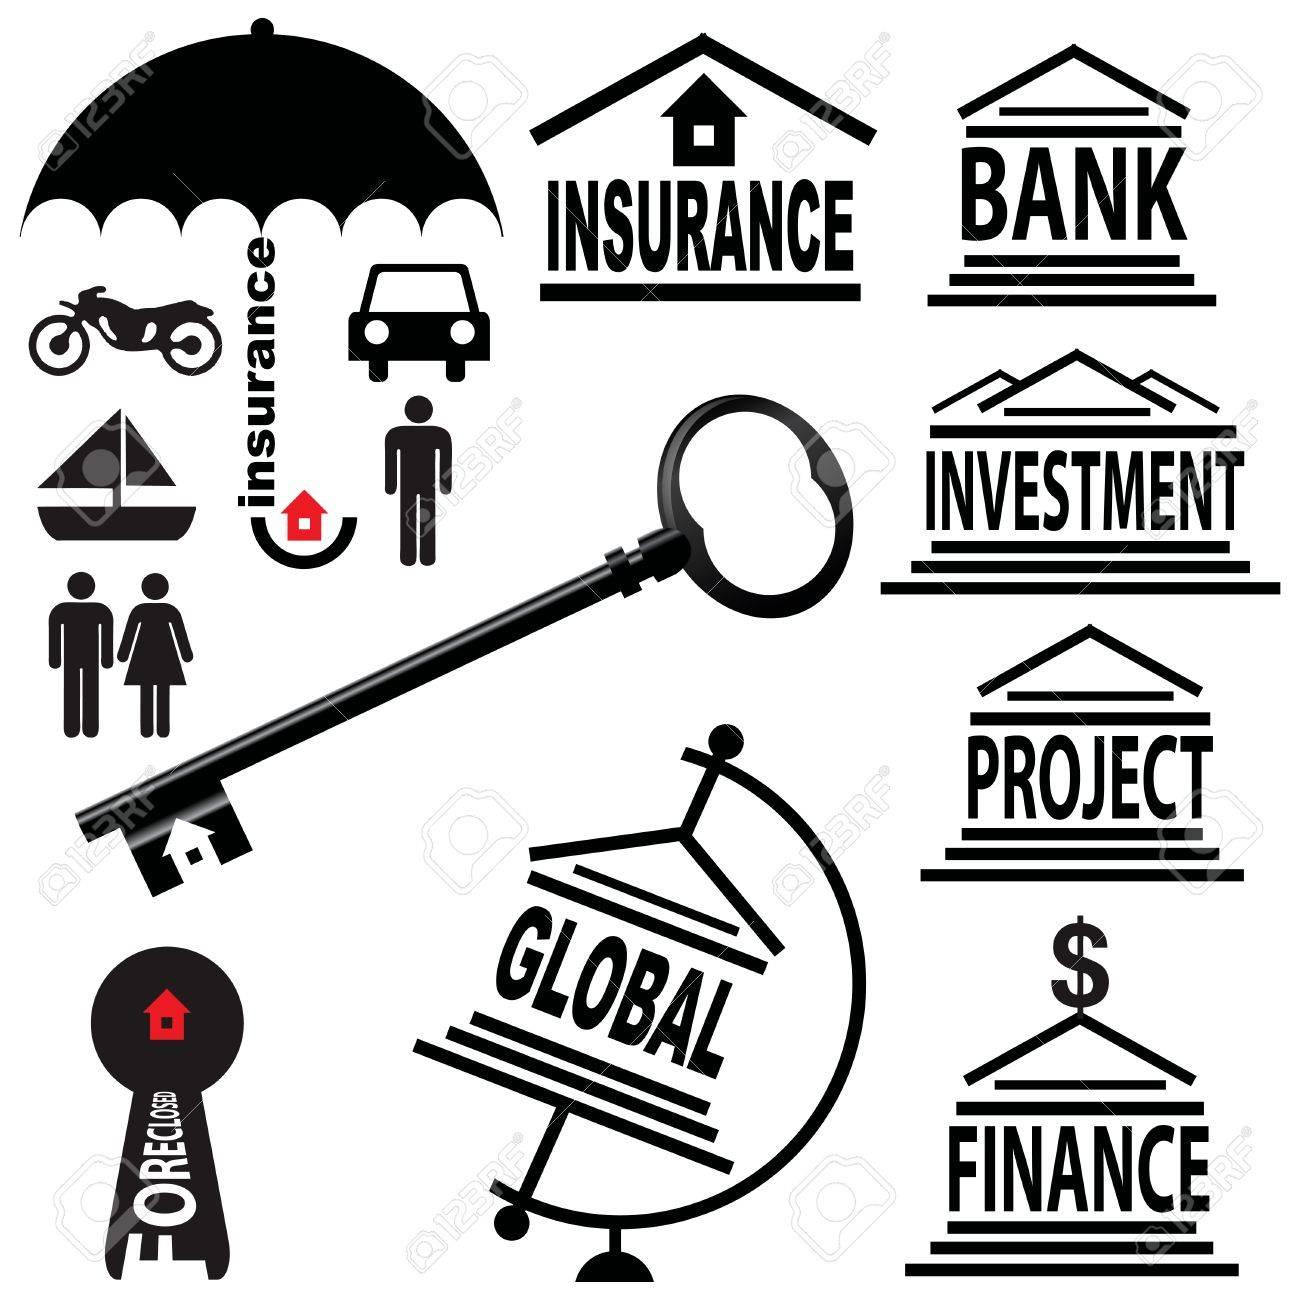 Creative on the financial topics Stock Vector - 13164252